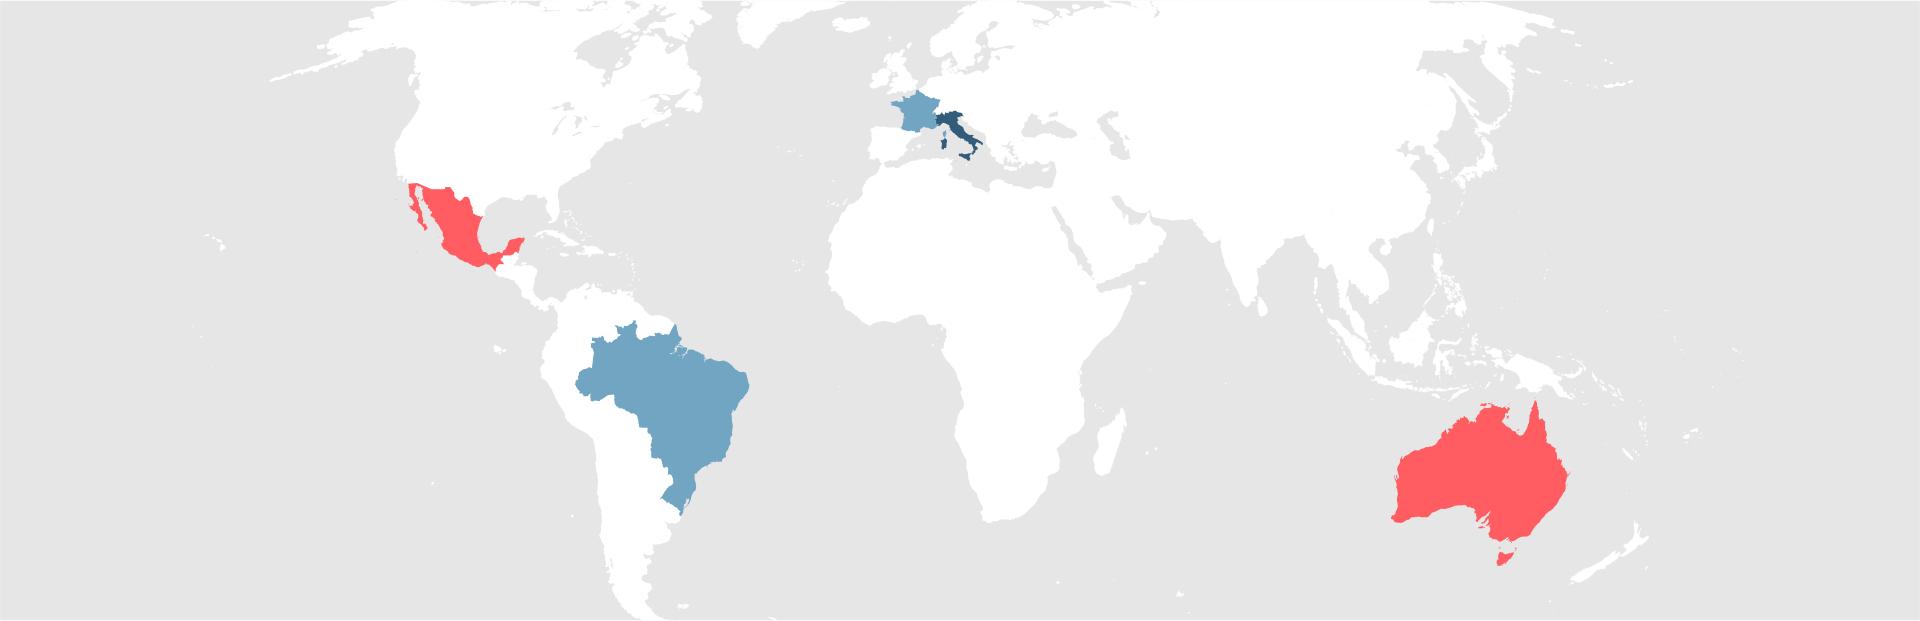 bluprint-case-studies-emi-map.jpg